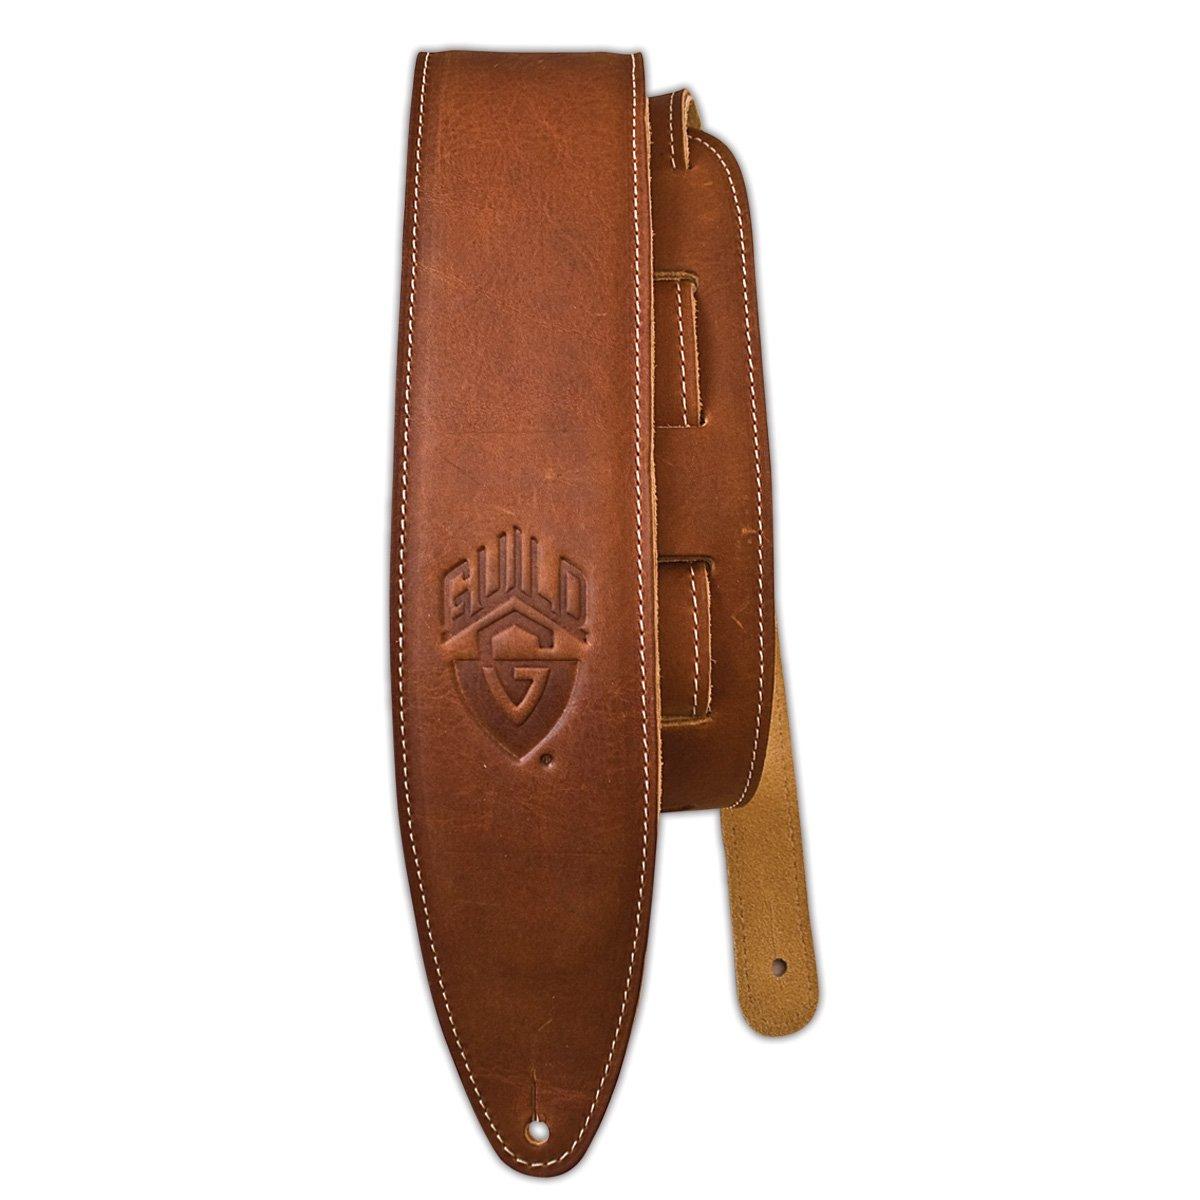 Guild Guitars Leather Guitar Strap - Brown